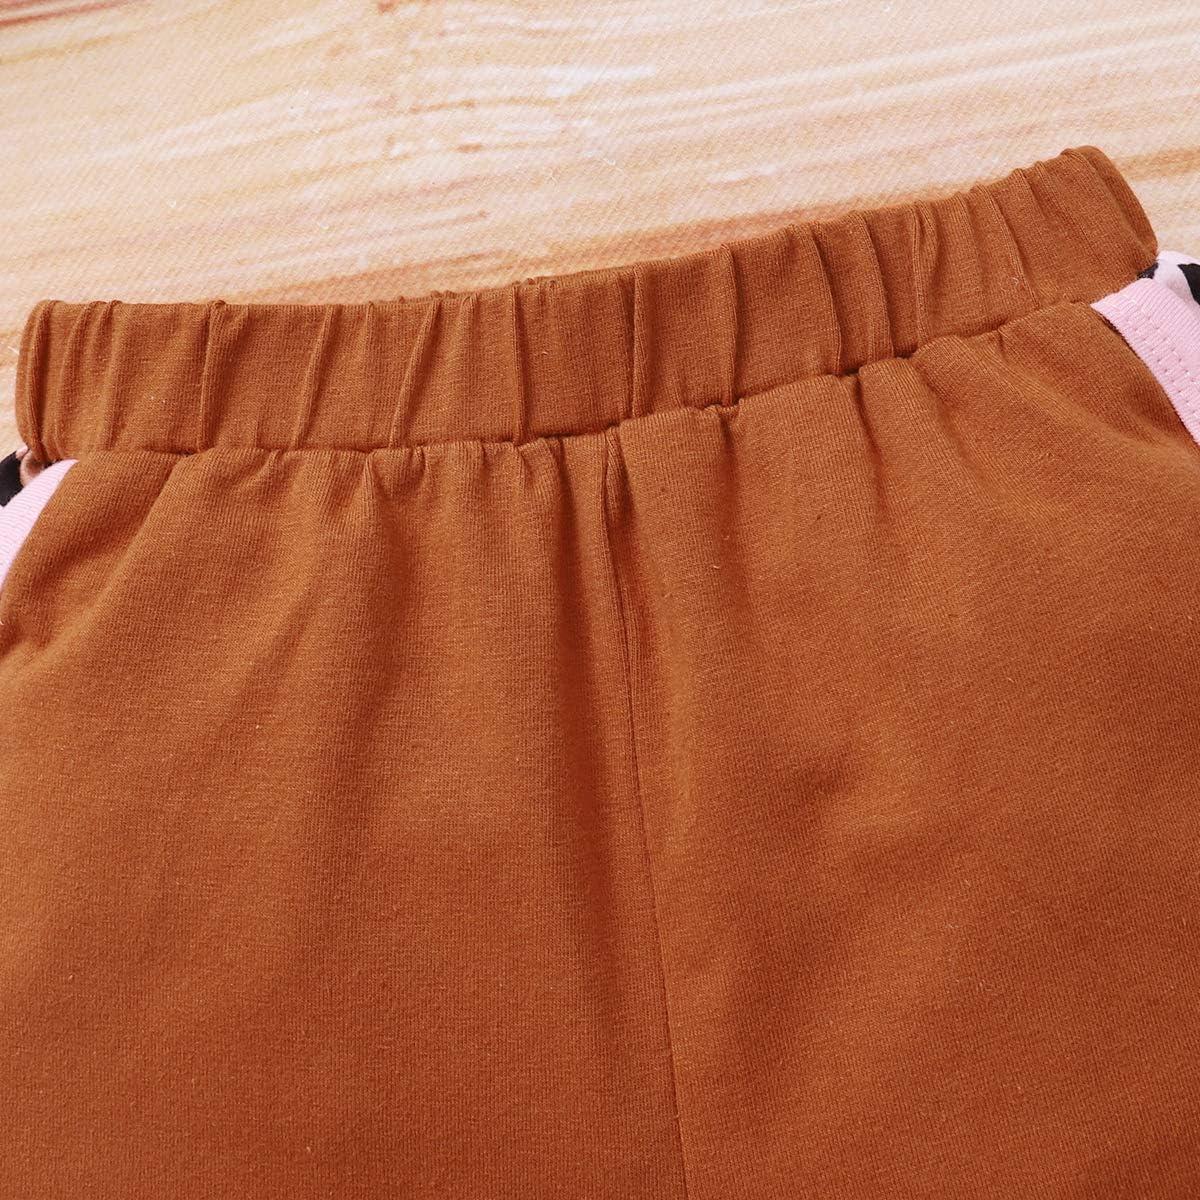 Toddler Kids Baby Girl Boy Tie Dye Summer Outfit Short Sleeve Shirt Top Shorts 2pcs Clothes Set